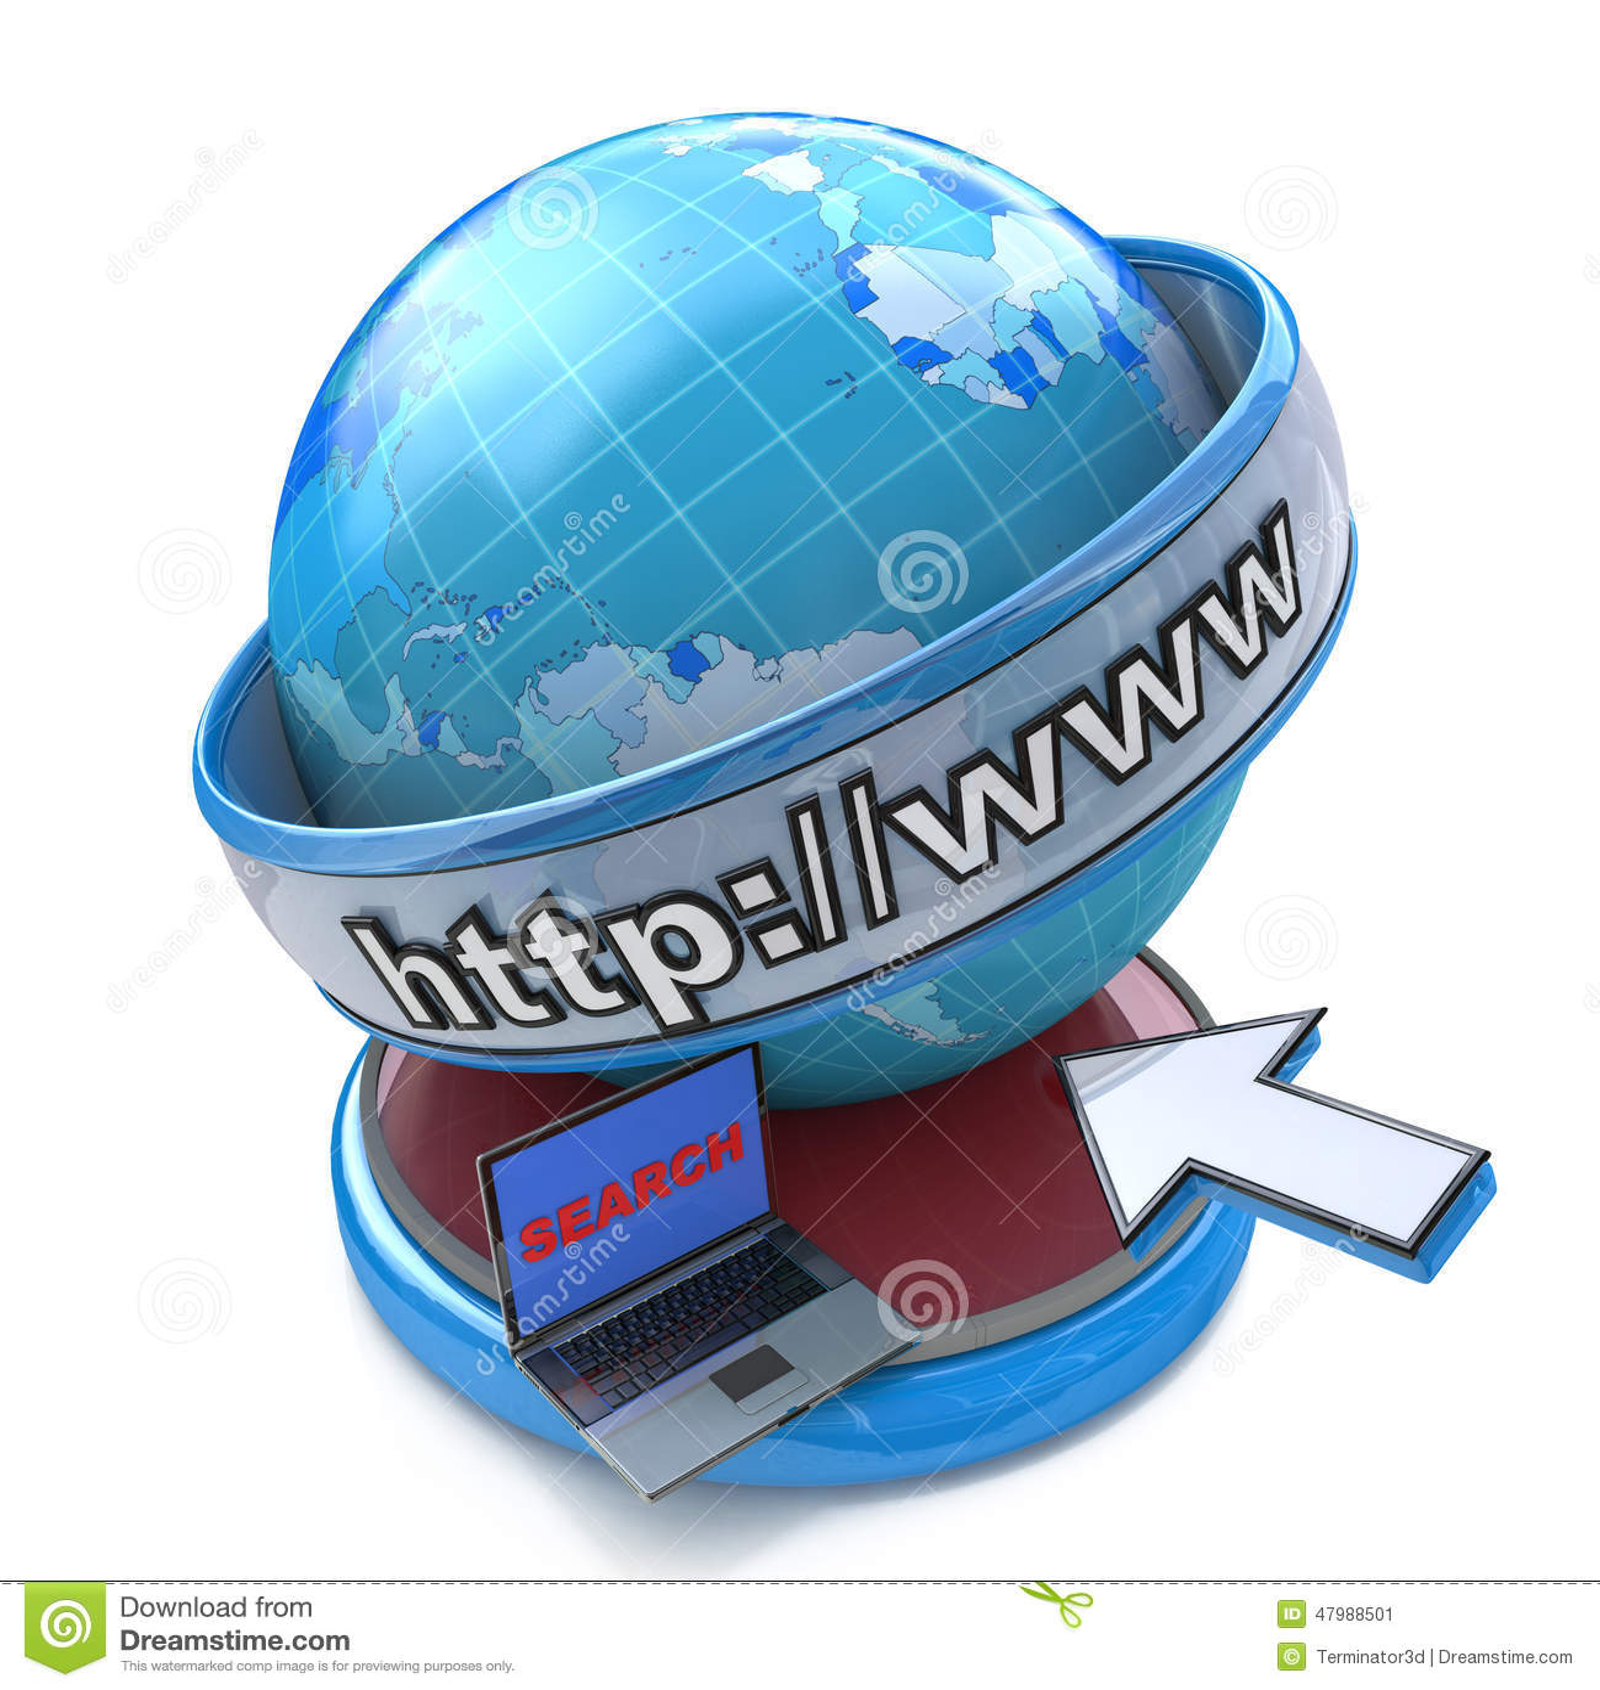 Bol Internet die concept, Web-pagina of Internet-browser zoeken